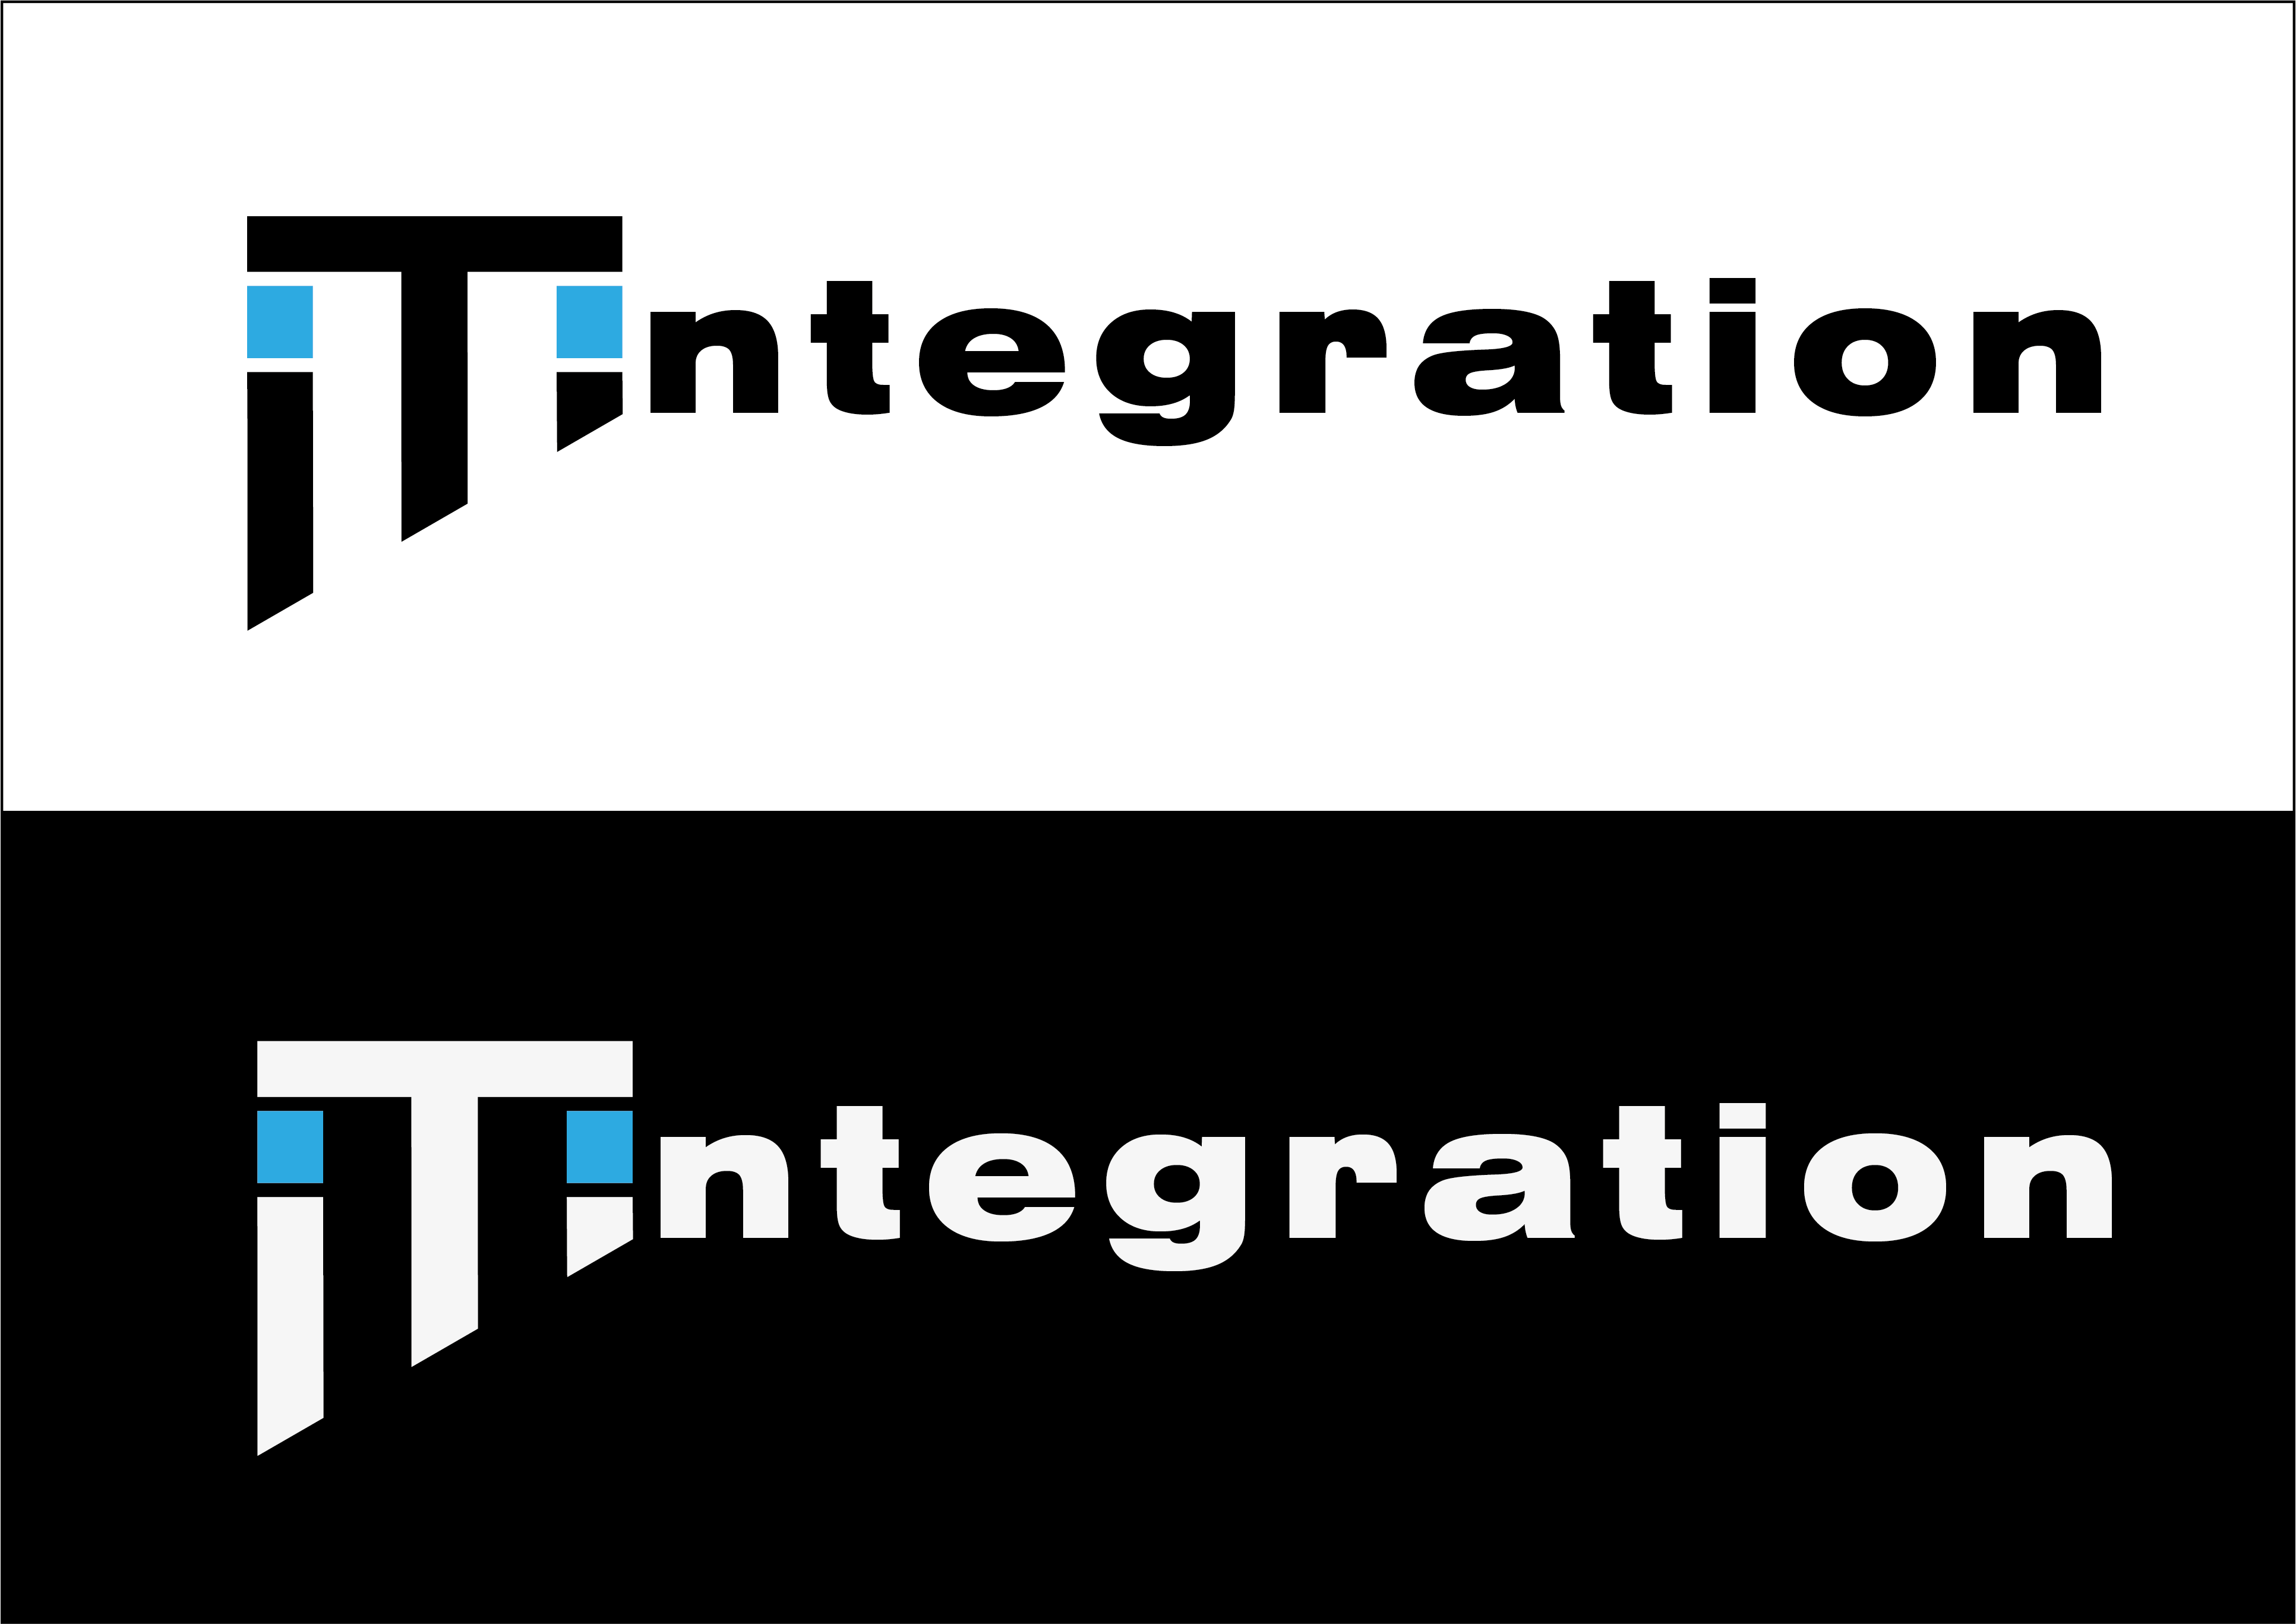 Логотип для IT интегратора фото f_903614a51ac56dfd.png